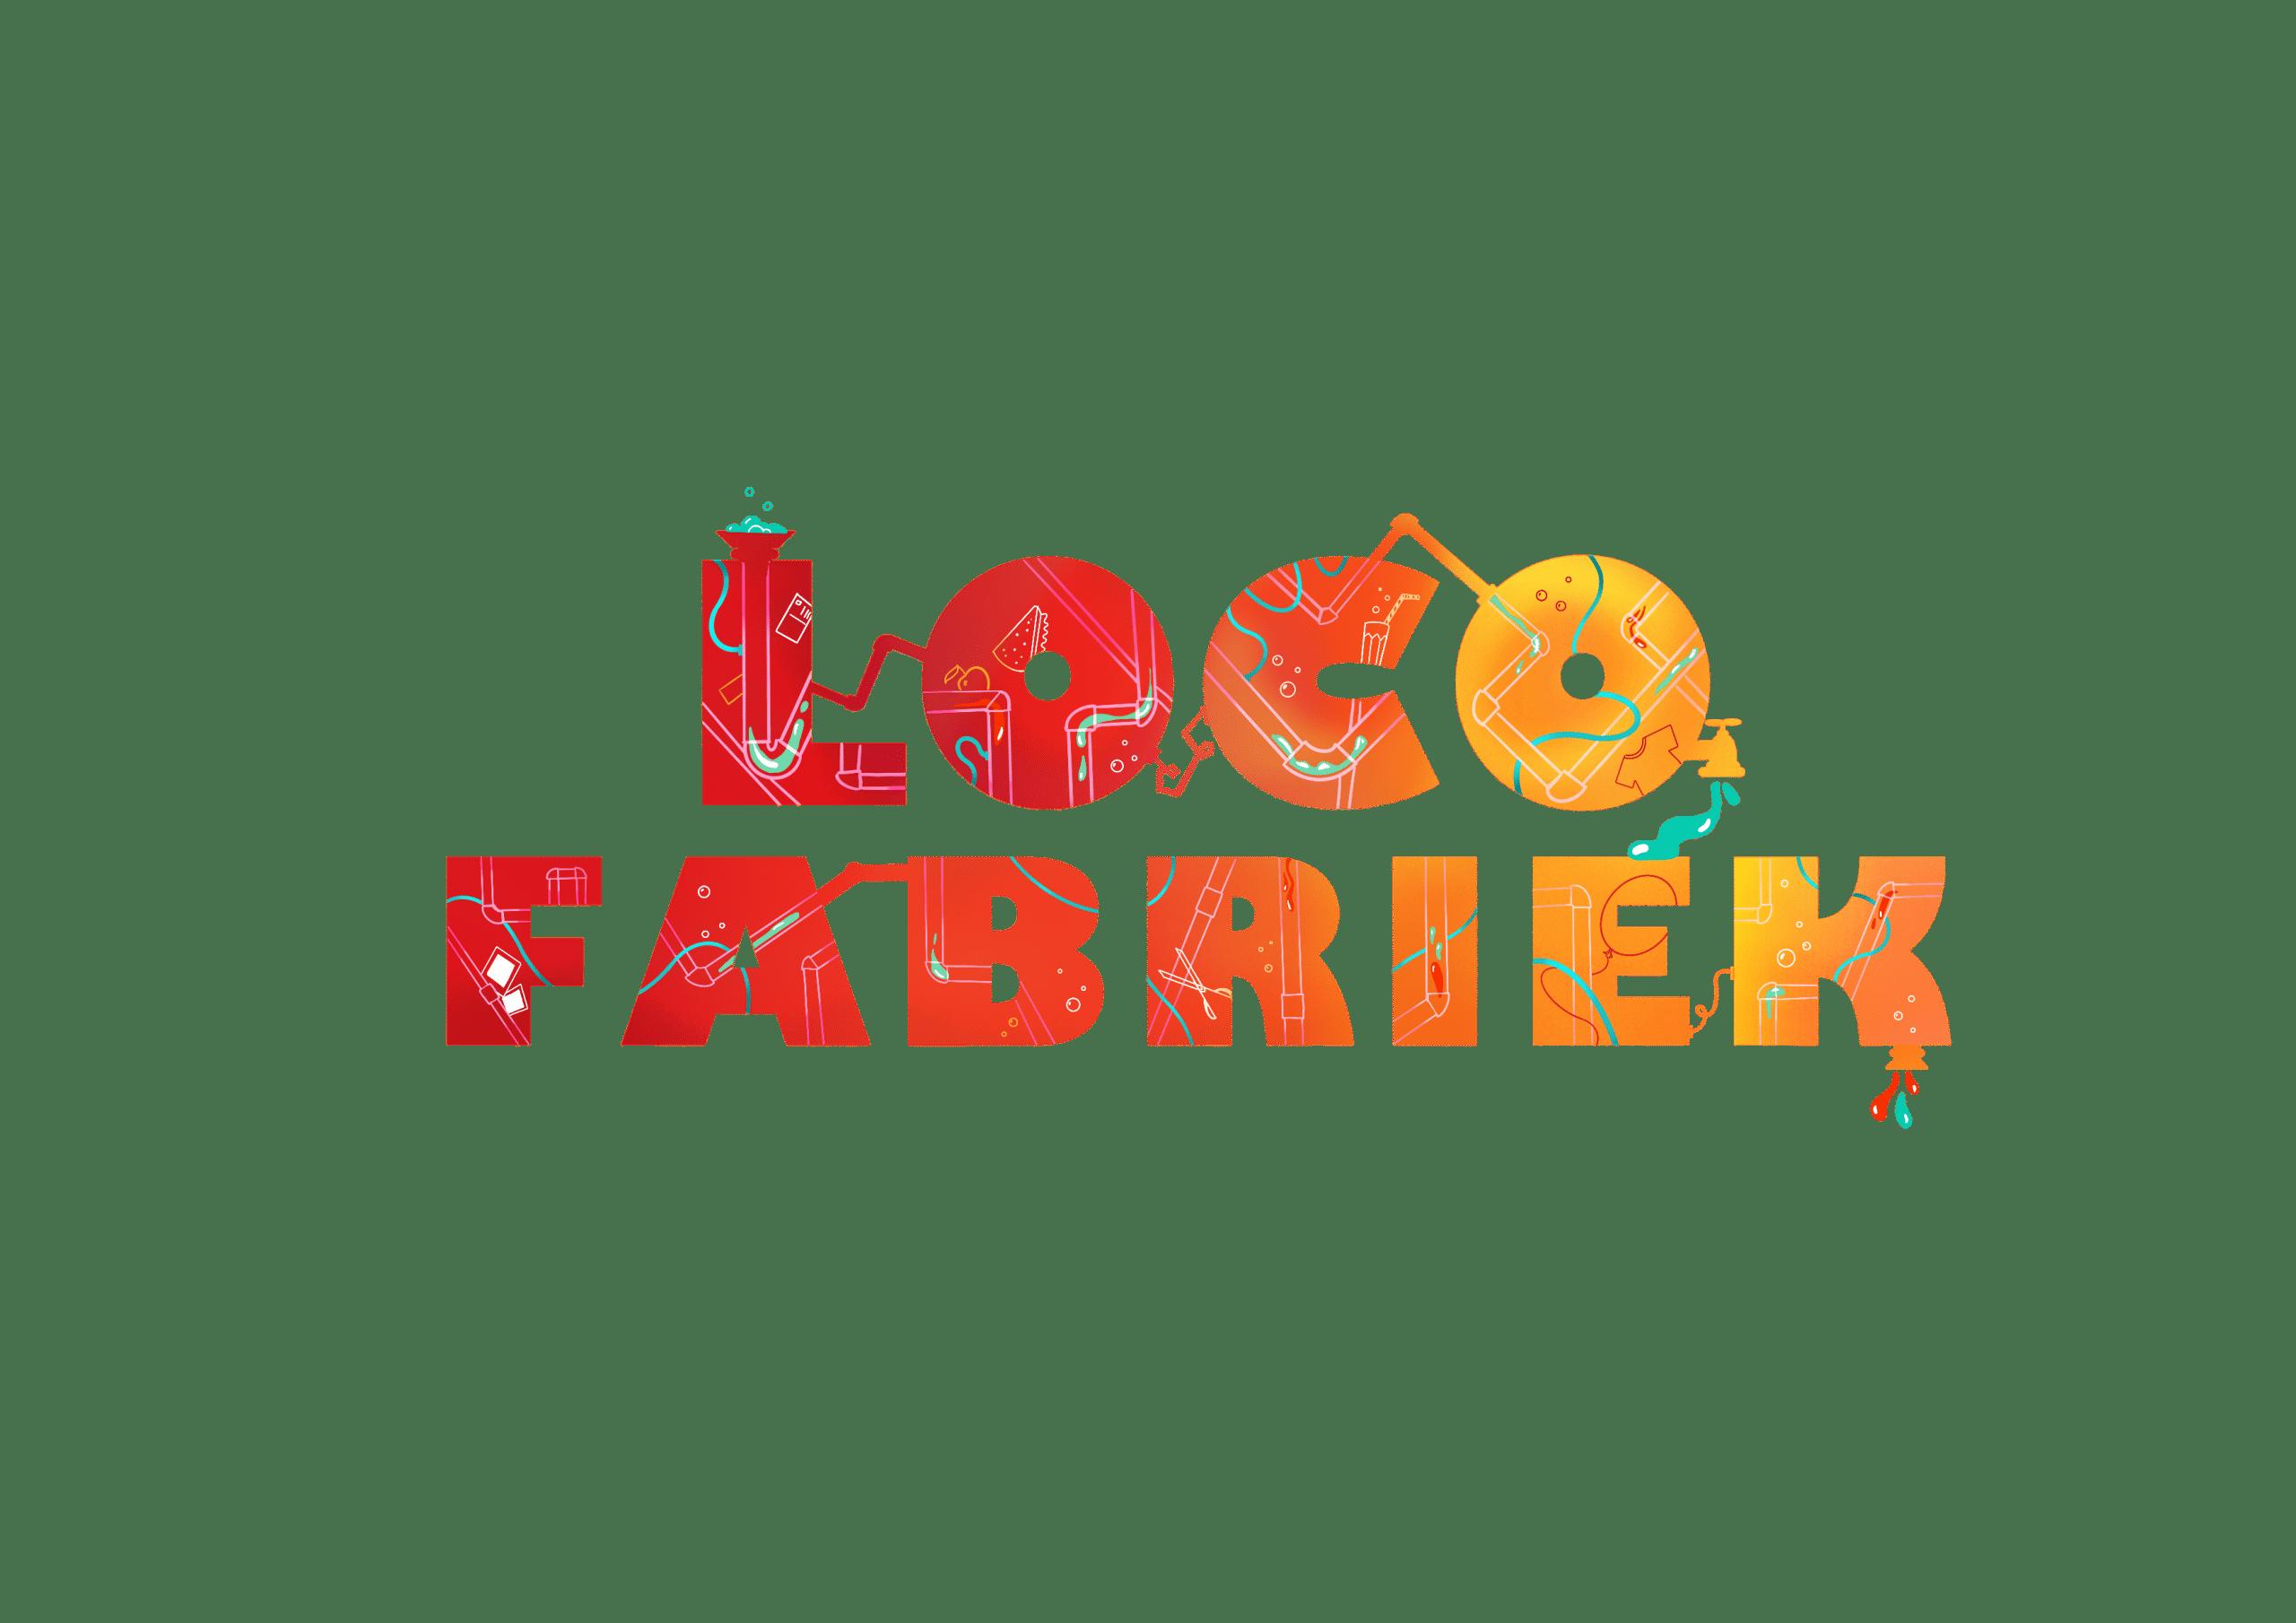 LOCO-Fabriek